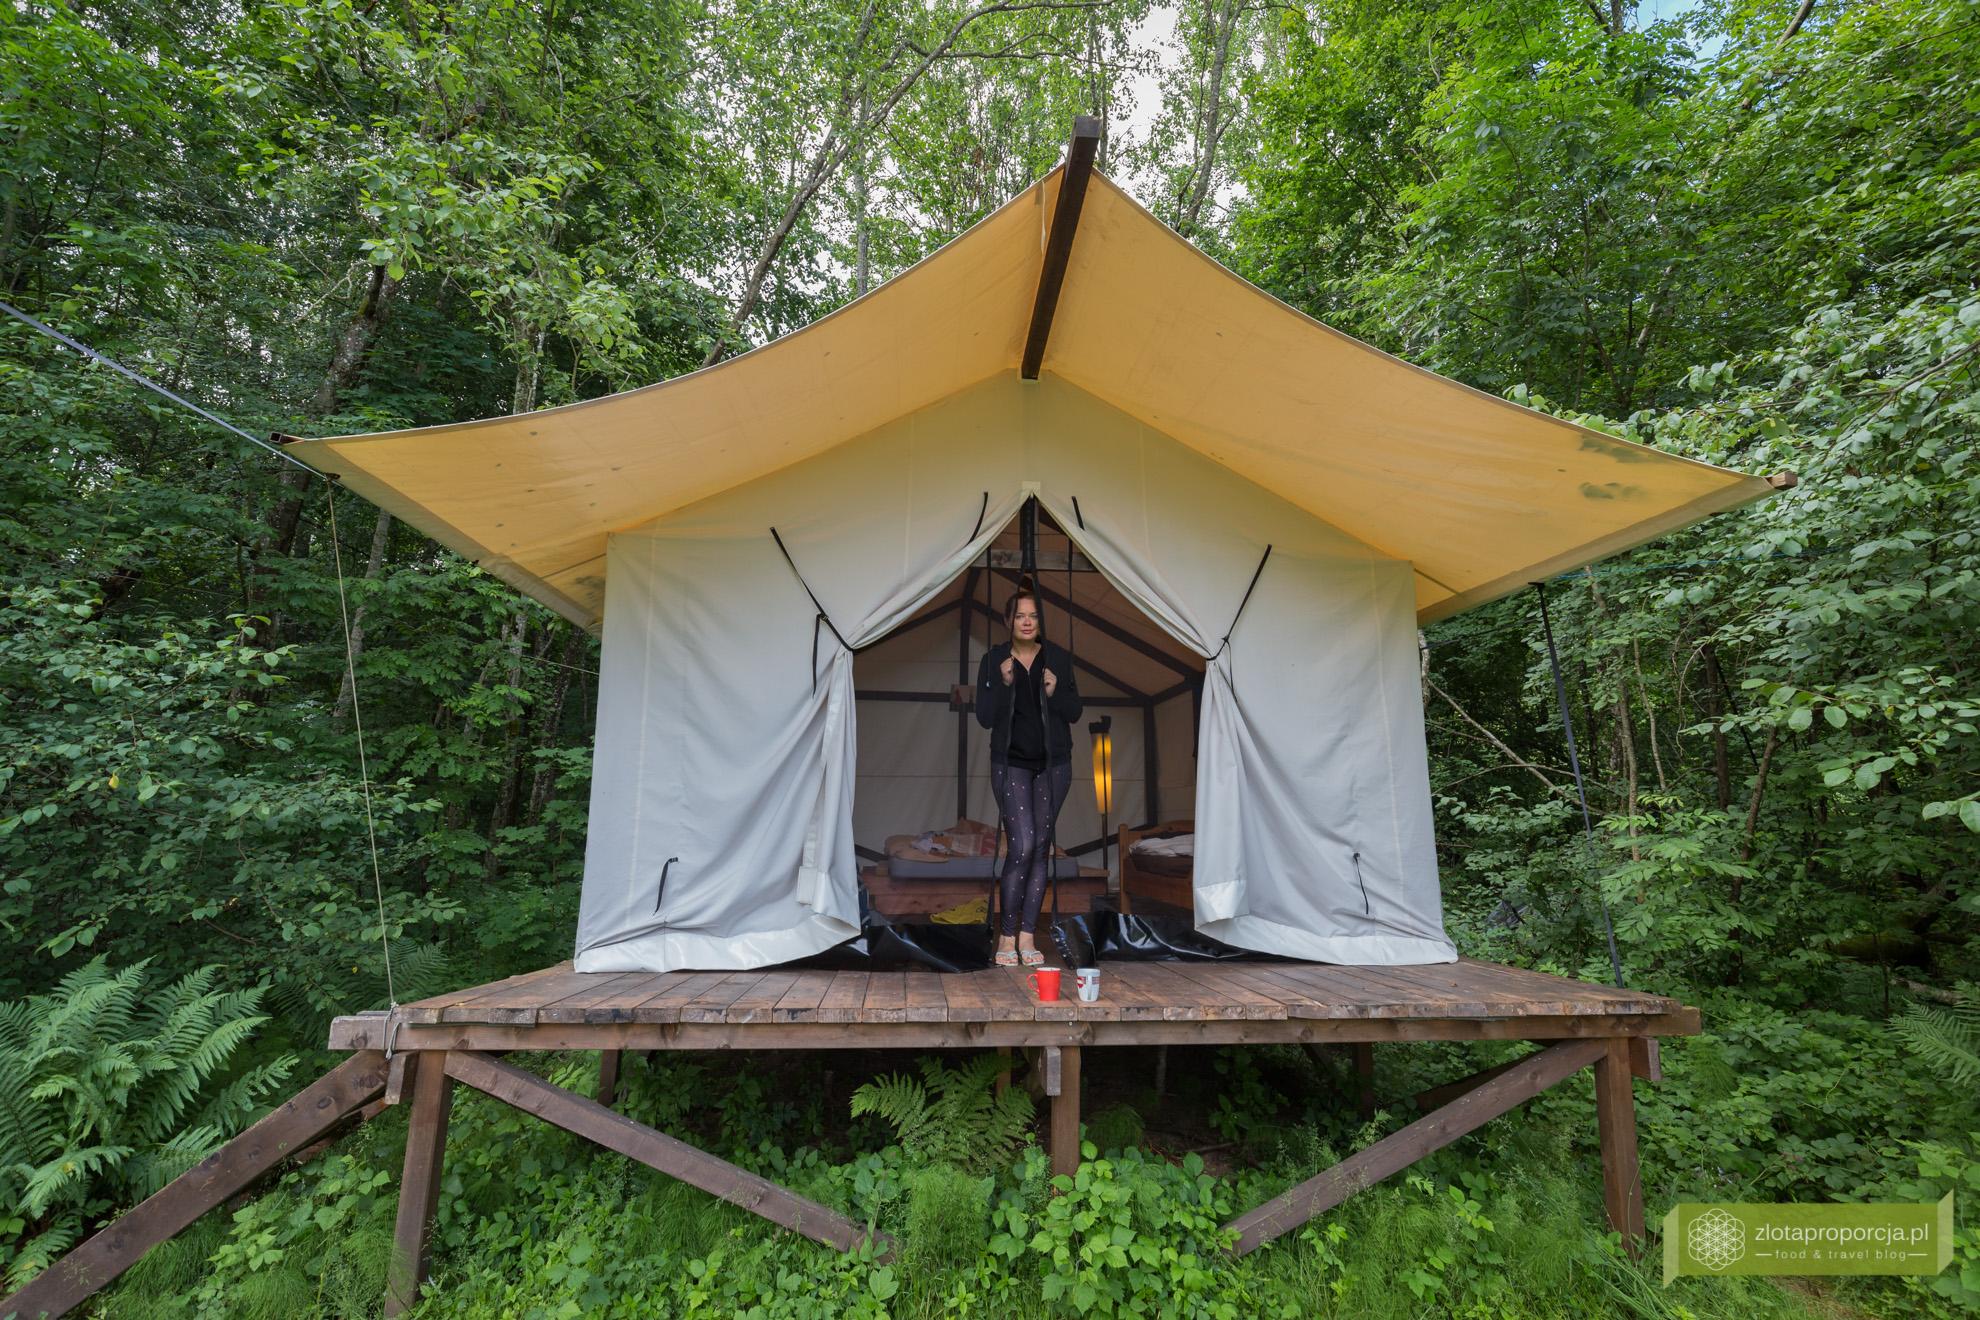 Łotwa, Park Narodowy Gauja, atrakcje Łotwy, Sigulda Glempings Klaukas